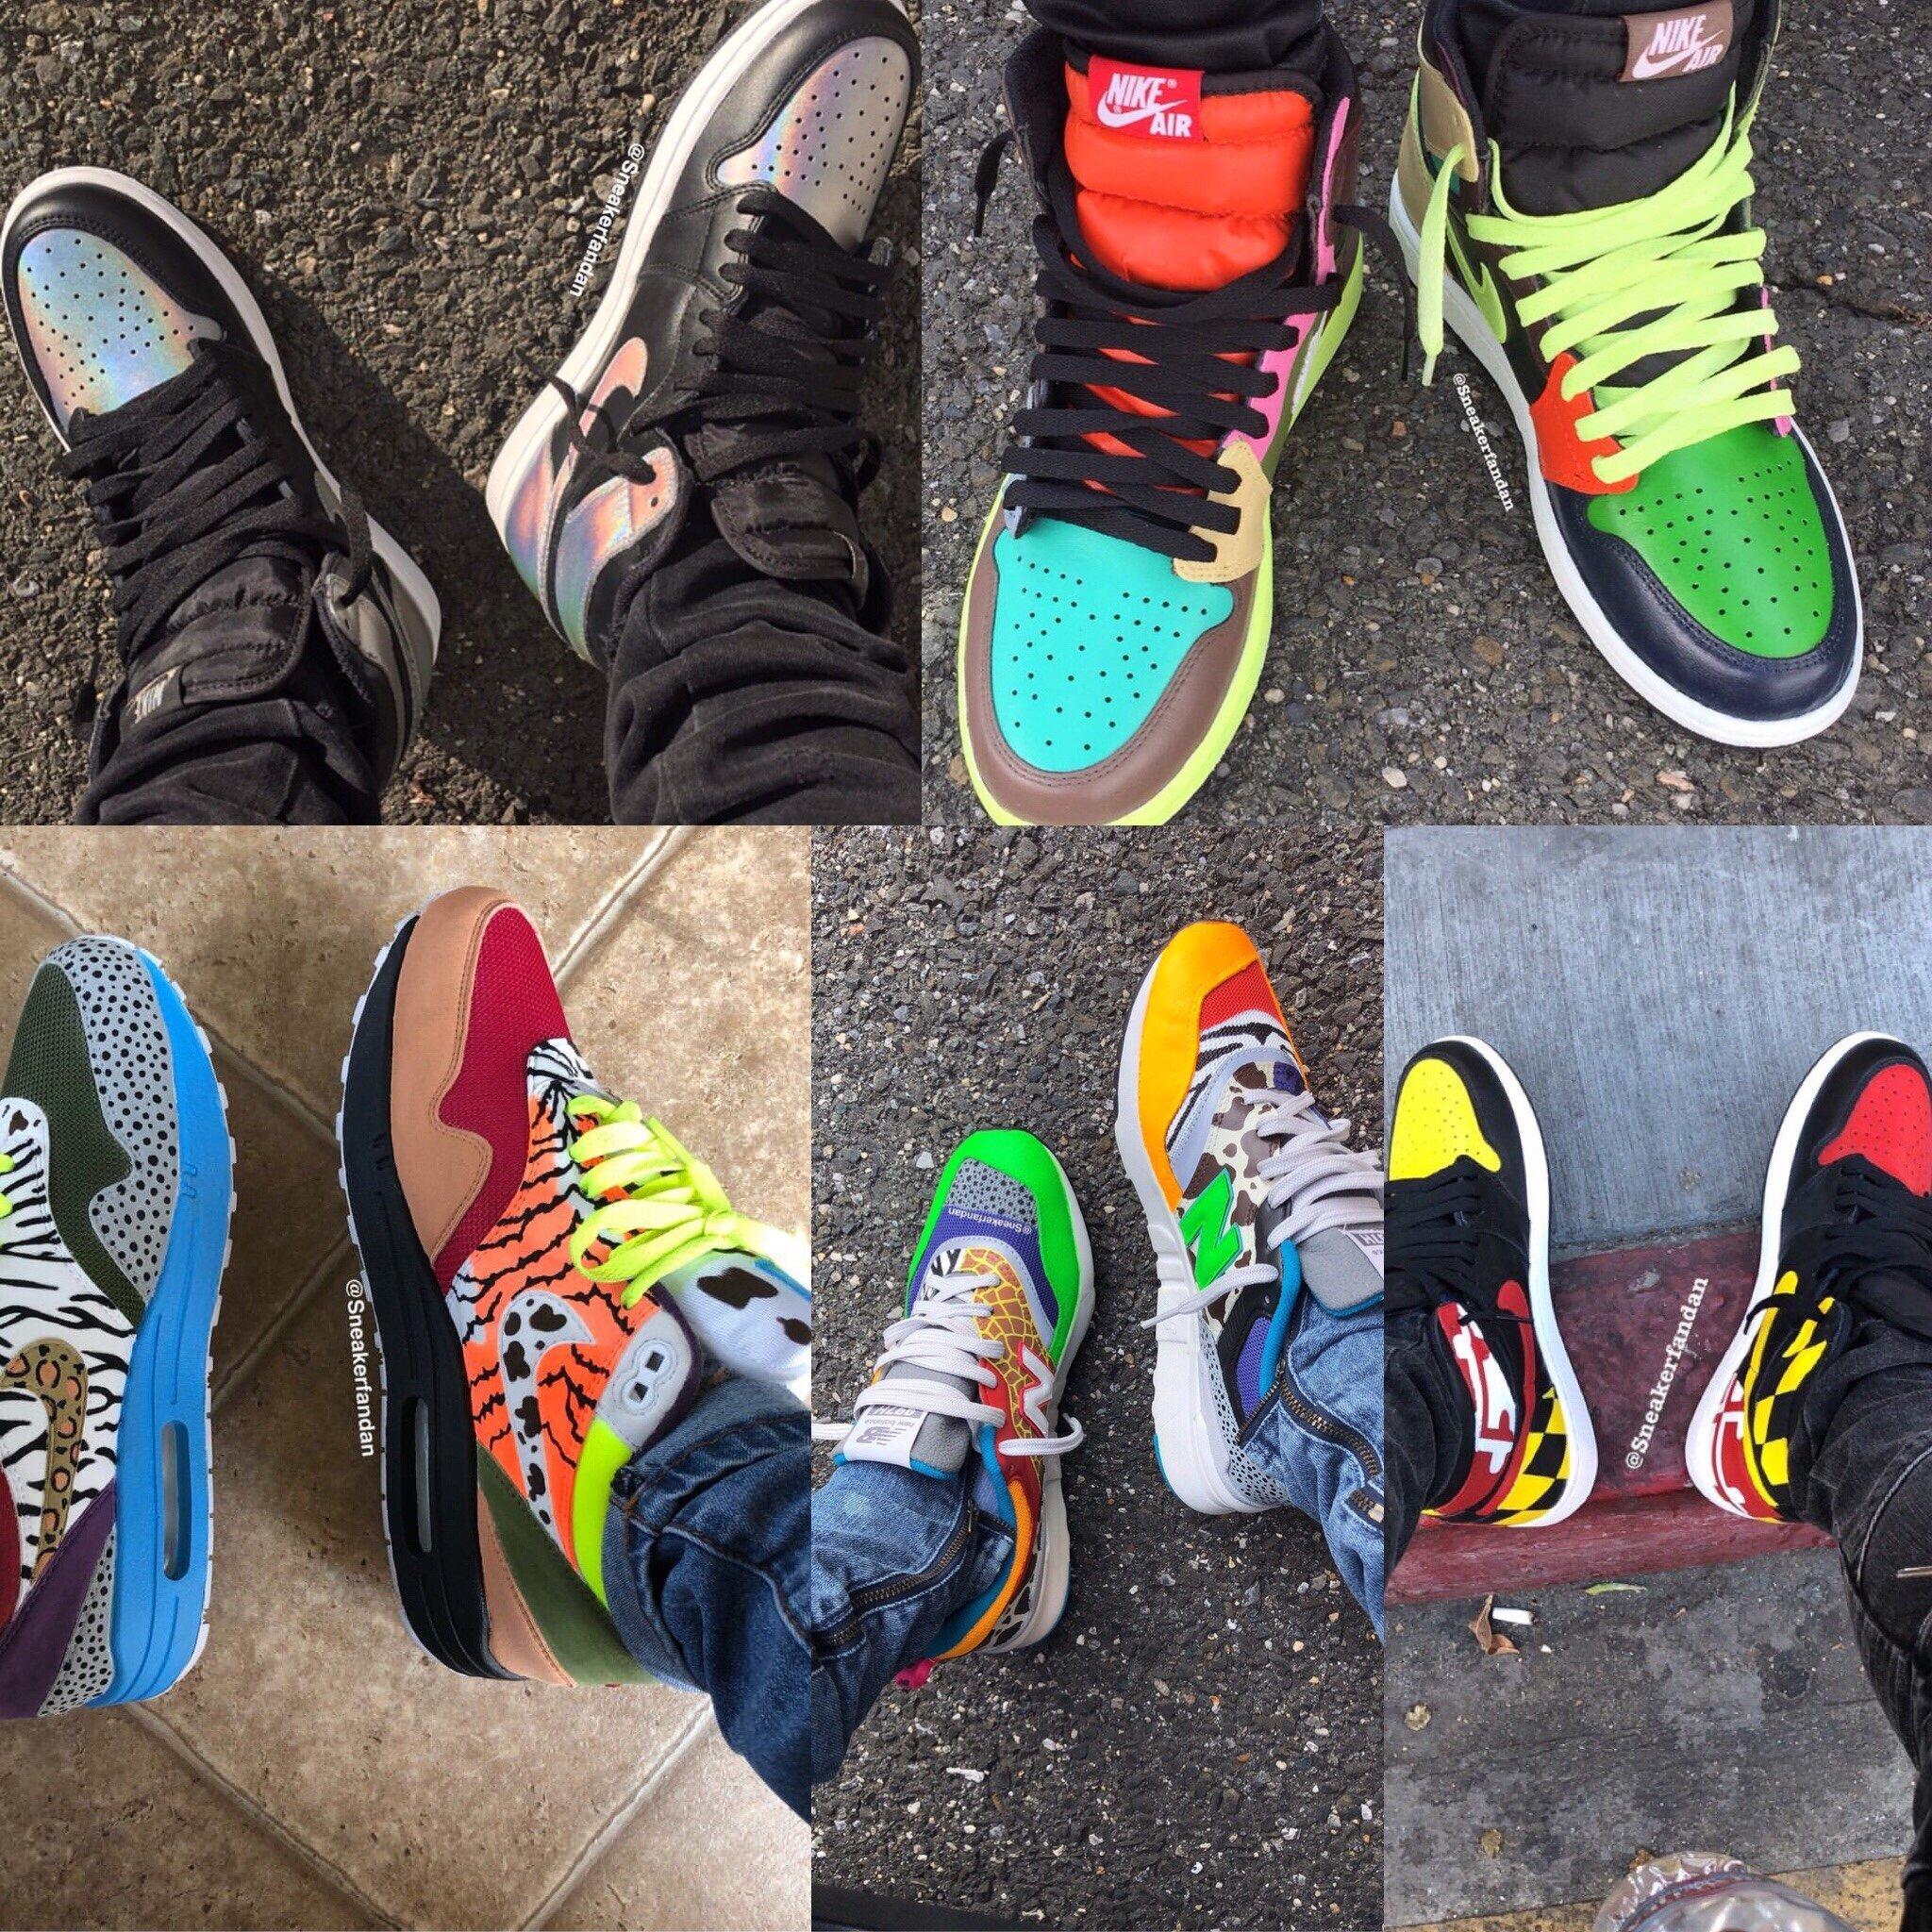 Danielle's Custom Kicks: Holographic 1s, No Clue 1s, Air Max, New Balance, Maryland 1s